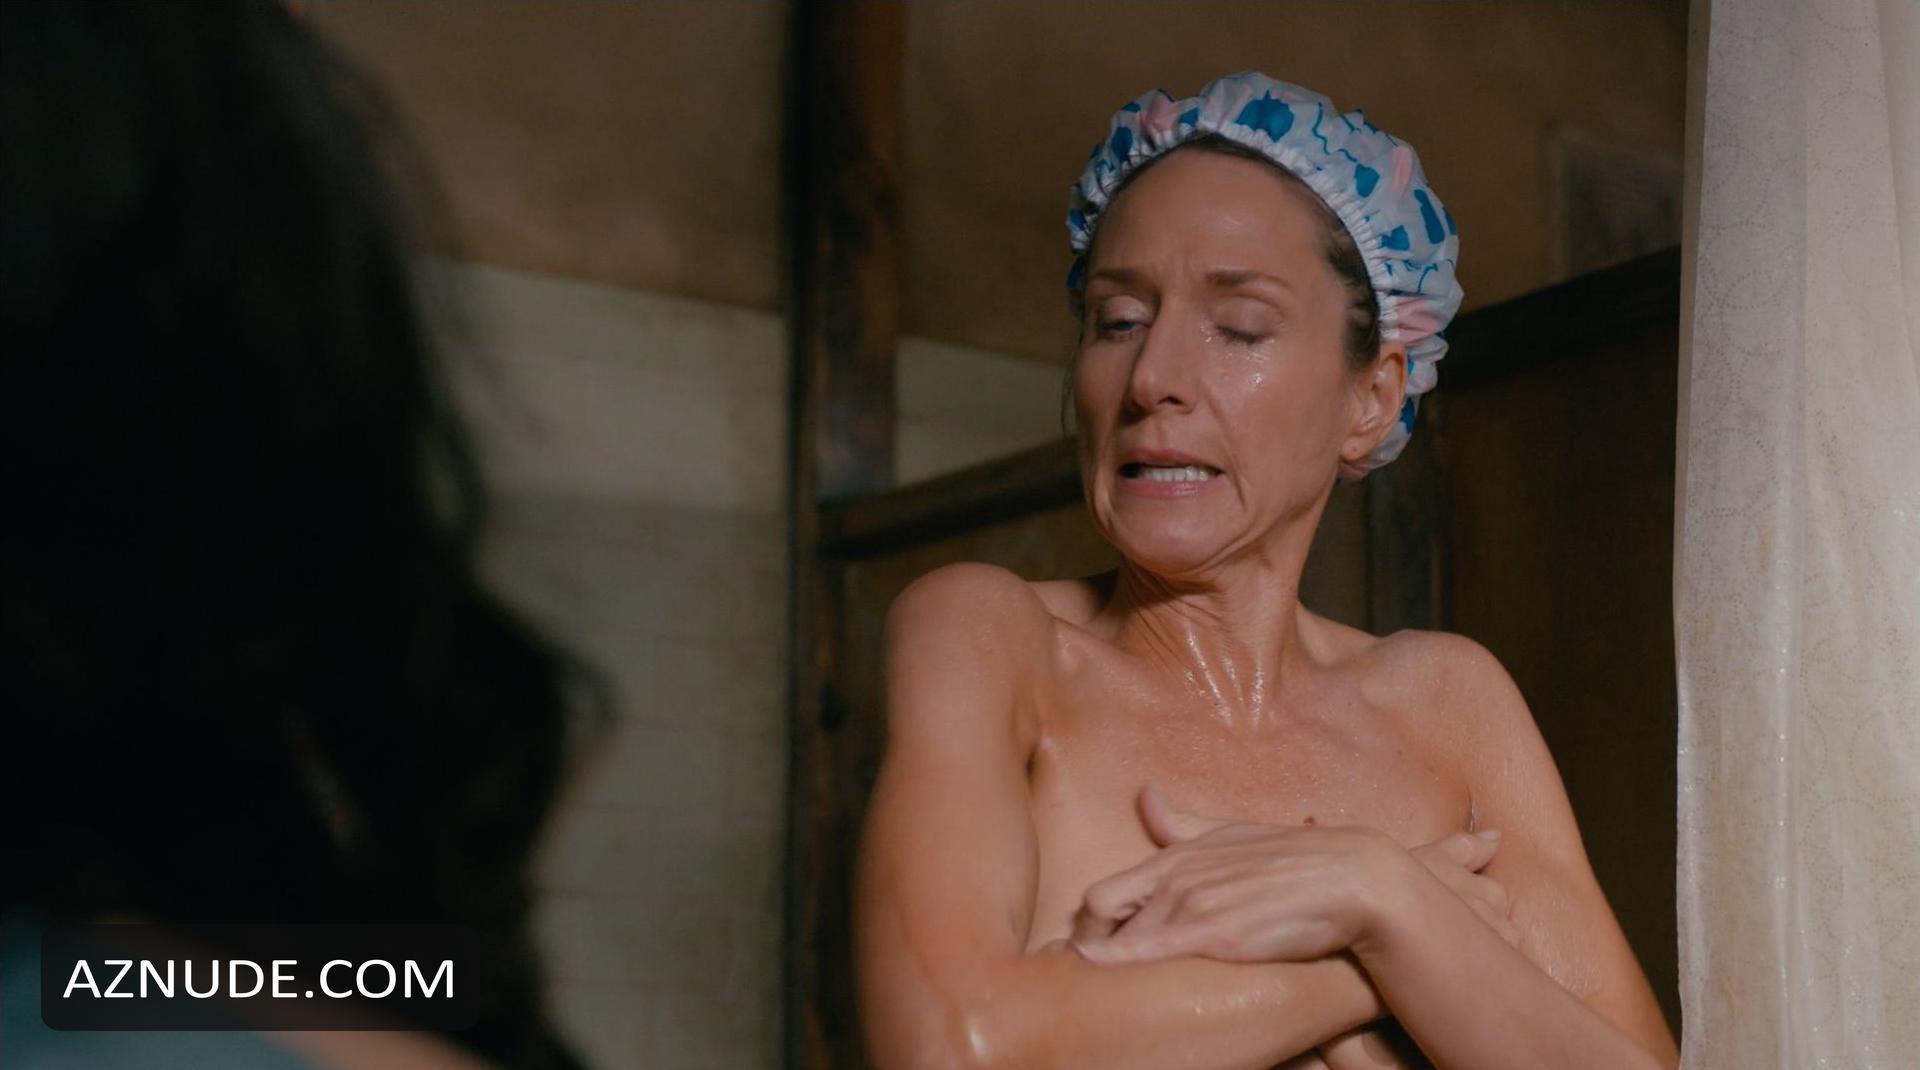 Butt Seana Kofoed naked (86 photo) Topless, Facebook, in bikini